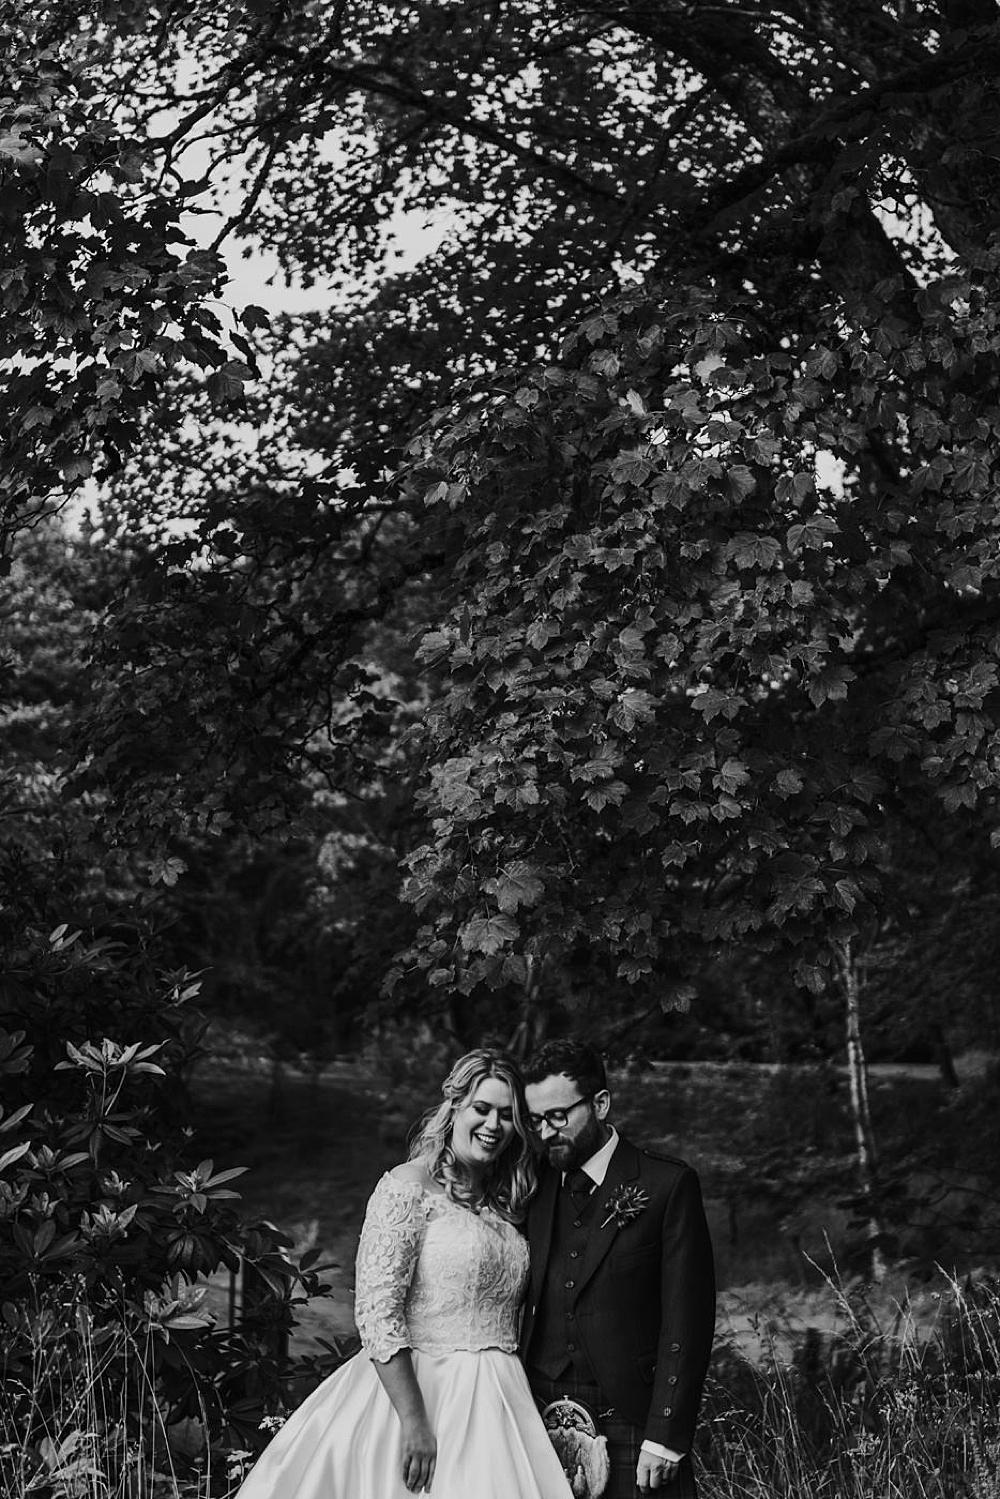 Burn House Edzell Weddings,The Gibsons,elegant wedding photographers glasgow,light and airy wedding photographers glasgow,light and bright,natural wedding photographers,romantic photographers Scotland,the gibsons wedding photography,two wedding photographers scotland,